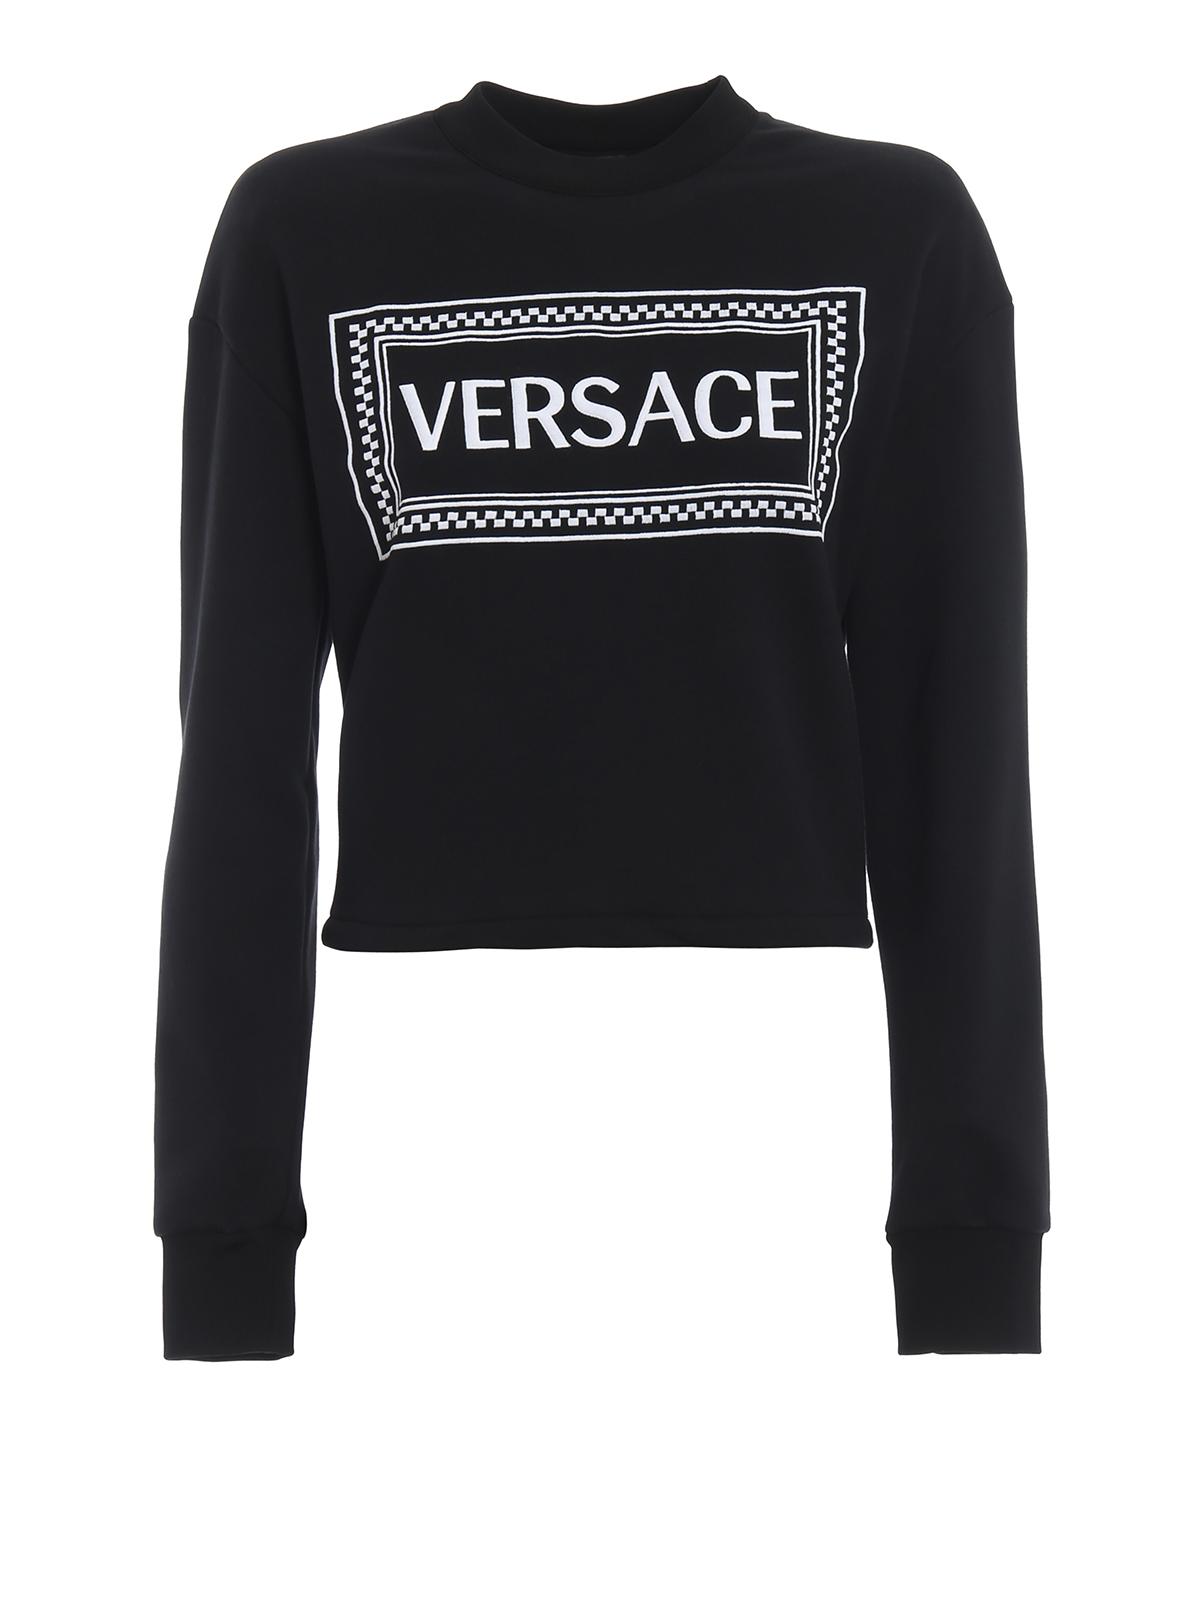 45fd399137 Versace - Versace 90s Vintage logo cropped sweatshirt - Sweatshirts ...